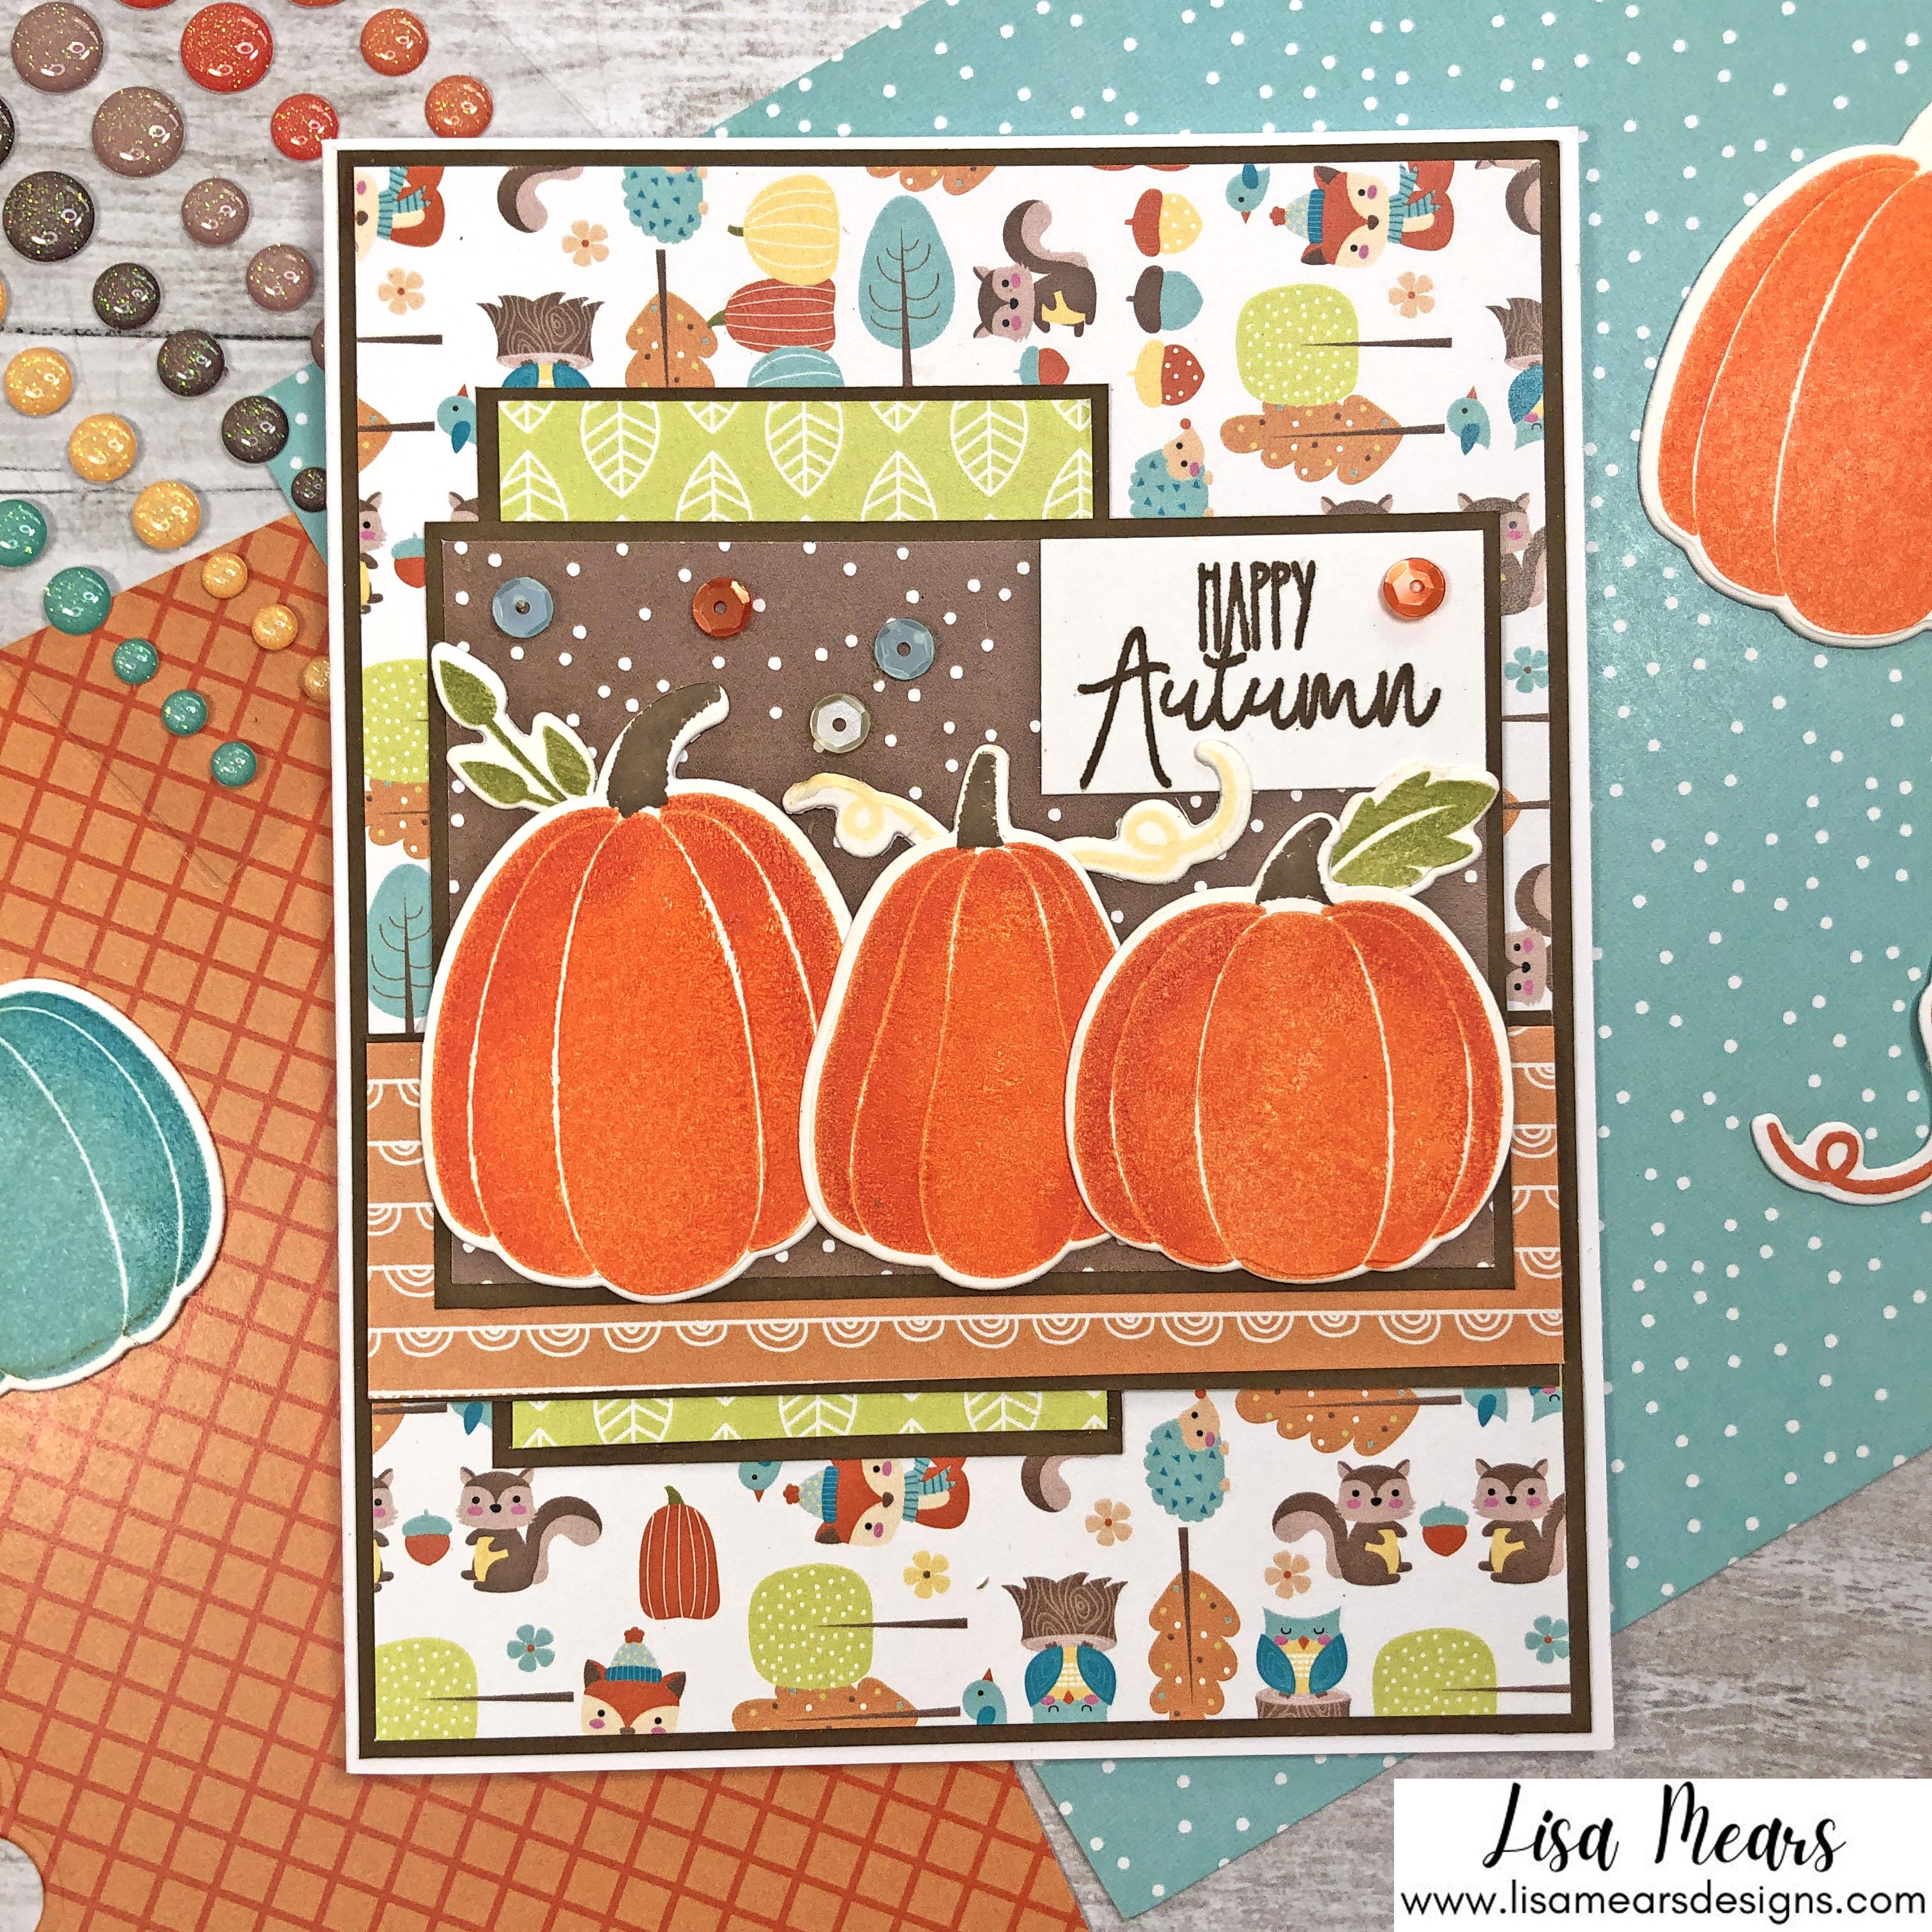 Pink and Main Crafty Courtyard Kit - September 2021 - Pumpkin Season